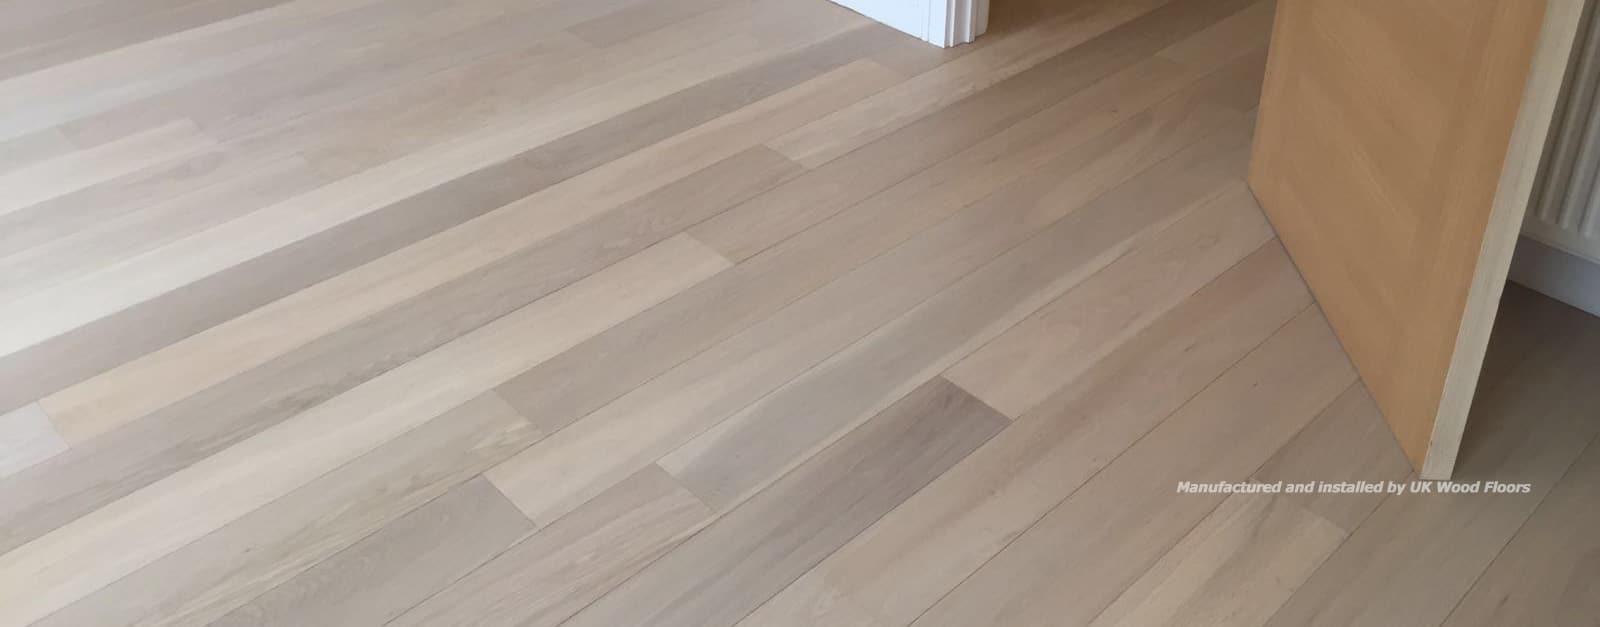 Solid Oak Planks Prime Ab Grade Uk Wood Floors Amp Bespoke